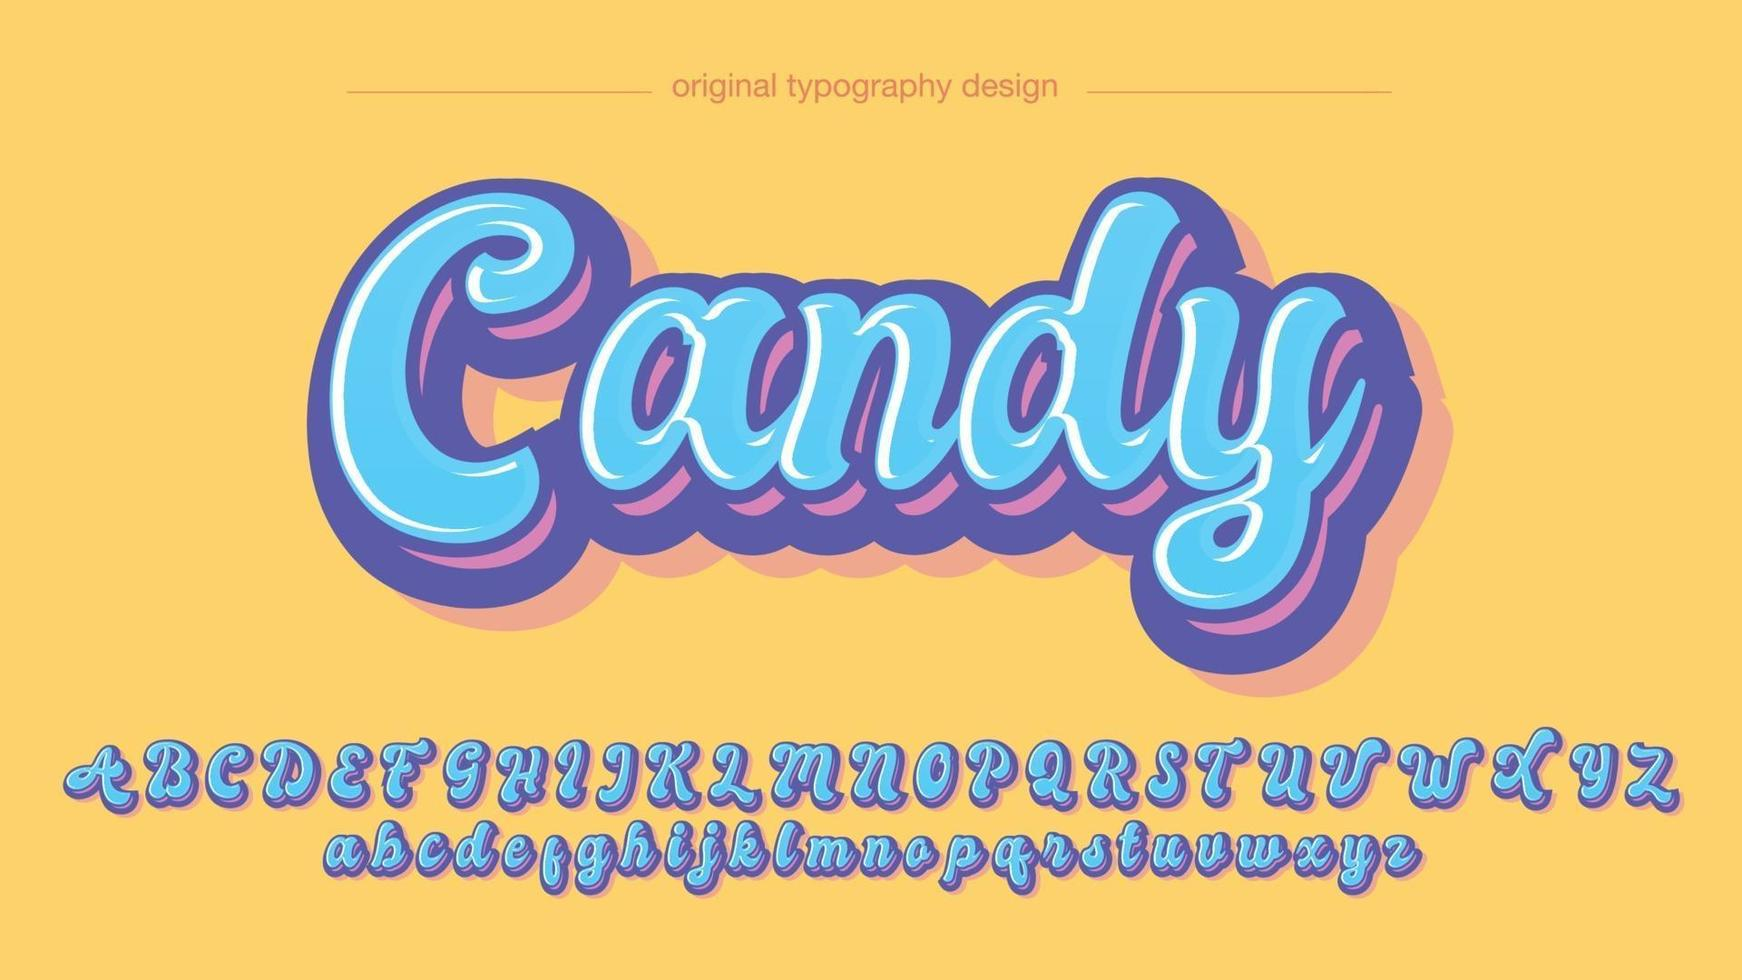 Blue Cute Bold Calligraphy Handwritten Cartoon Typography vector